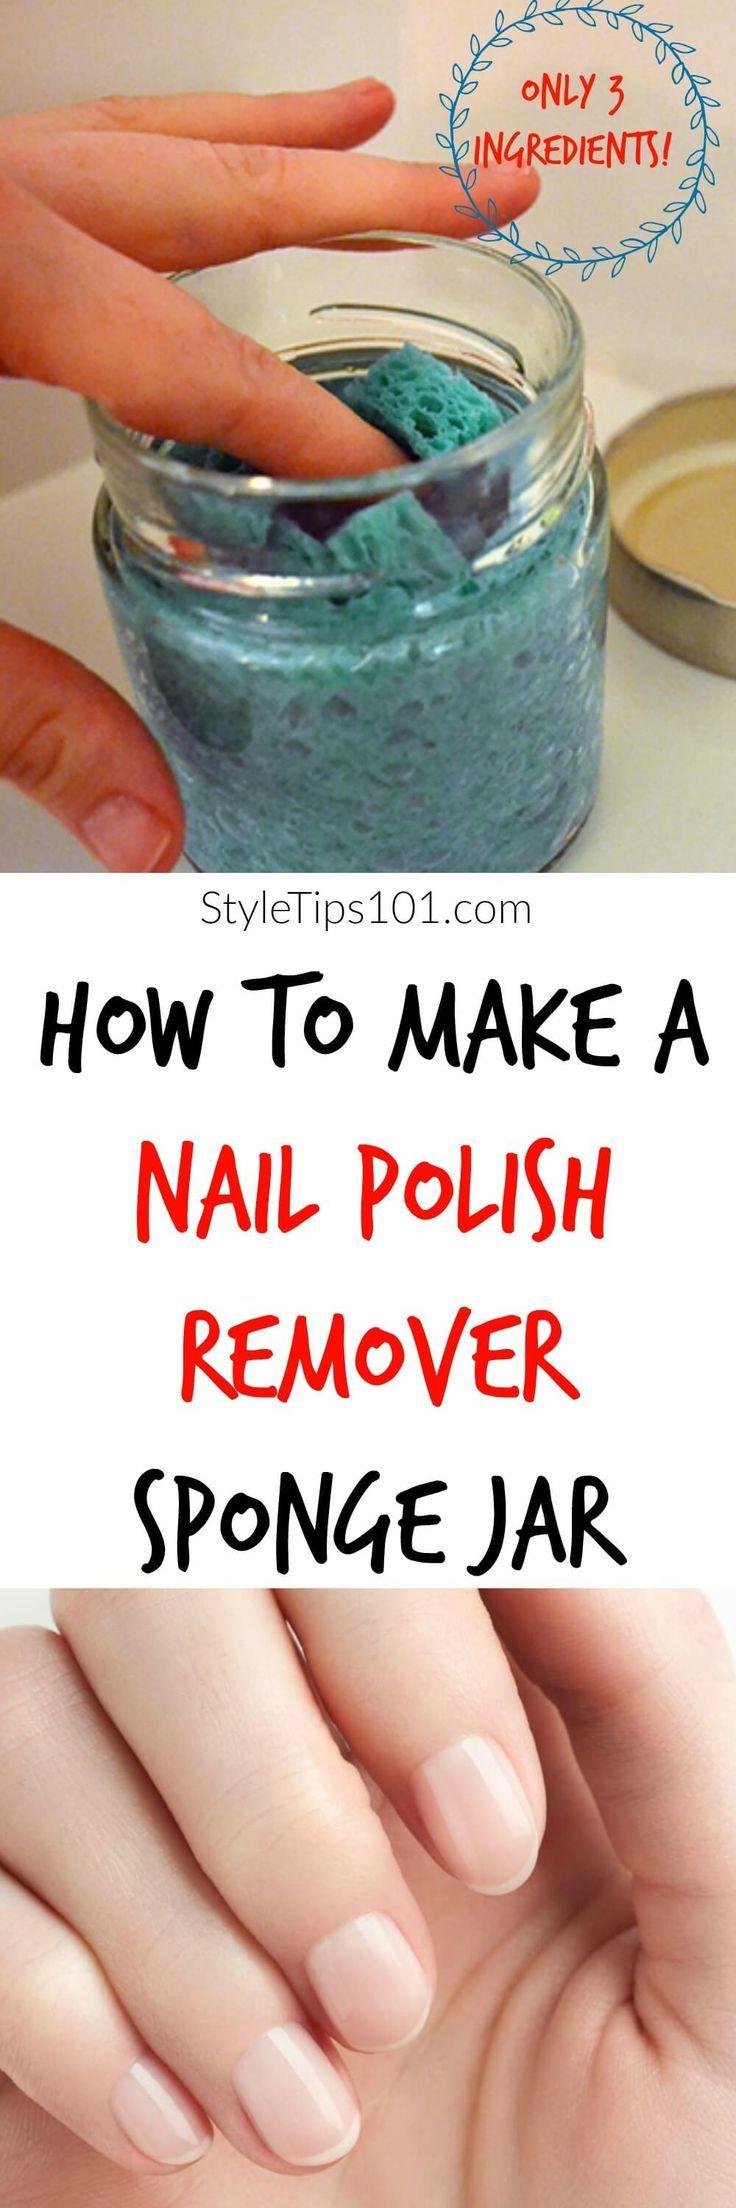 DIY Nail Polish Remover Sponge + 6 DIY Nail Polish Remover